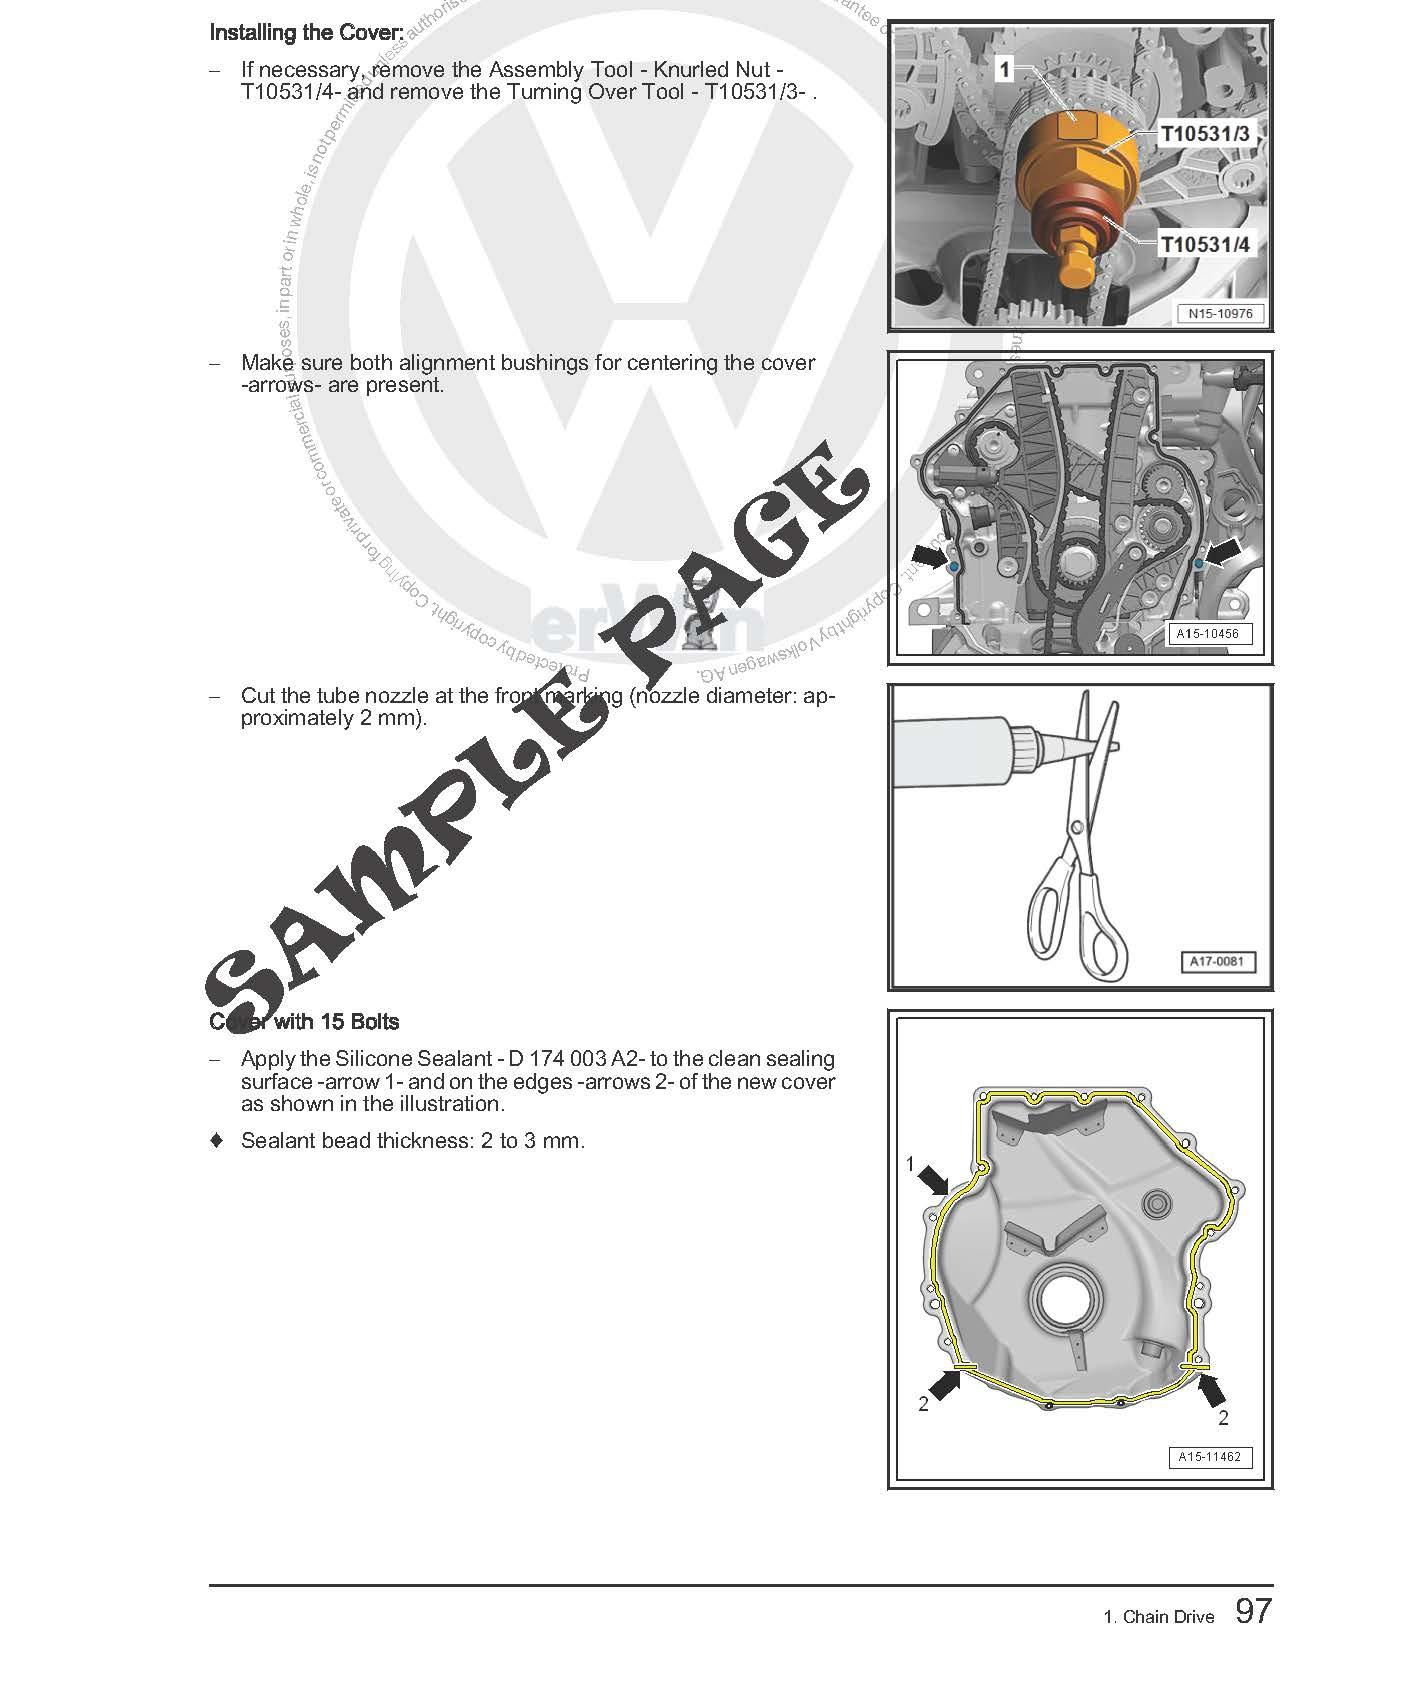 Infineon Aurix Tc3xx User Manual Pdf. Bests PDF herunterladen